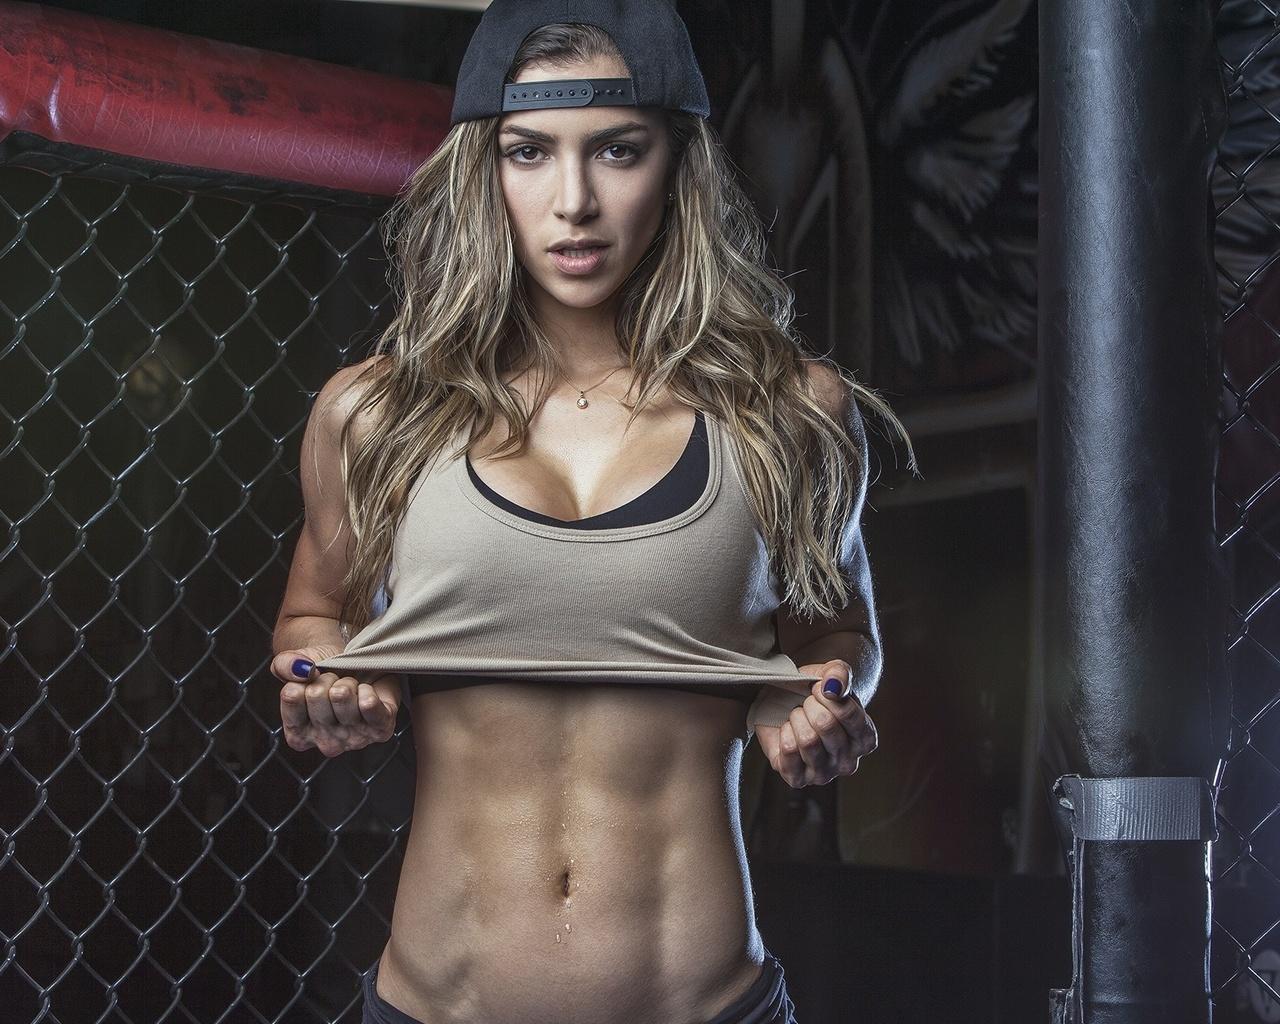 women, blonde, muscles, fitness, model, anllela sagra, фитоняшка,секси